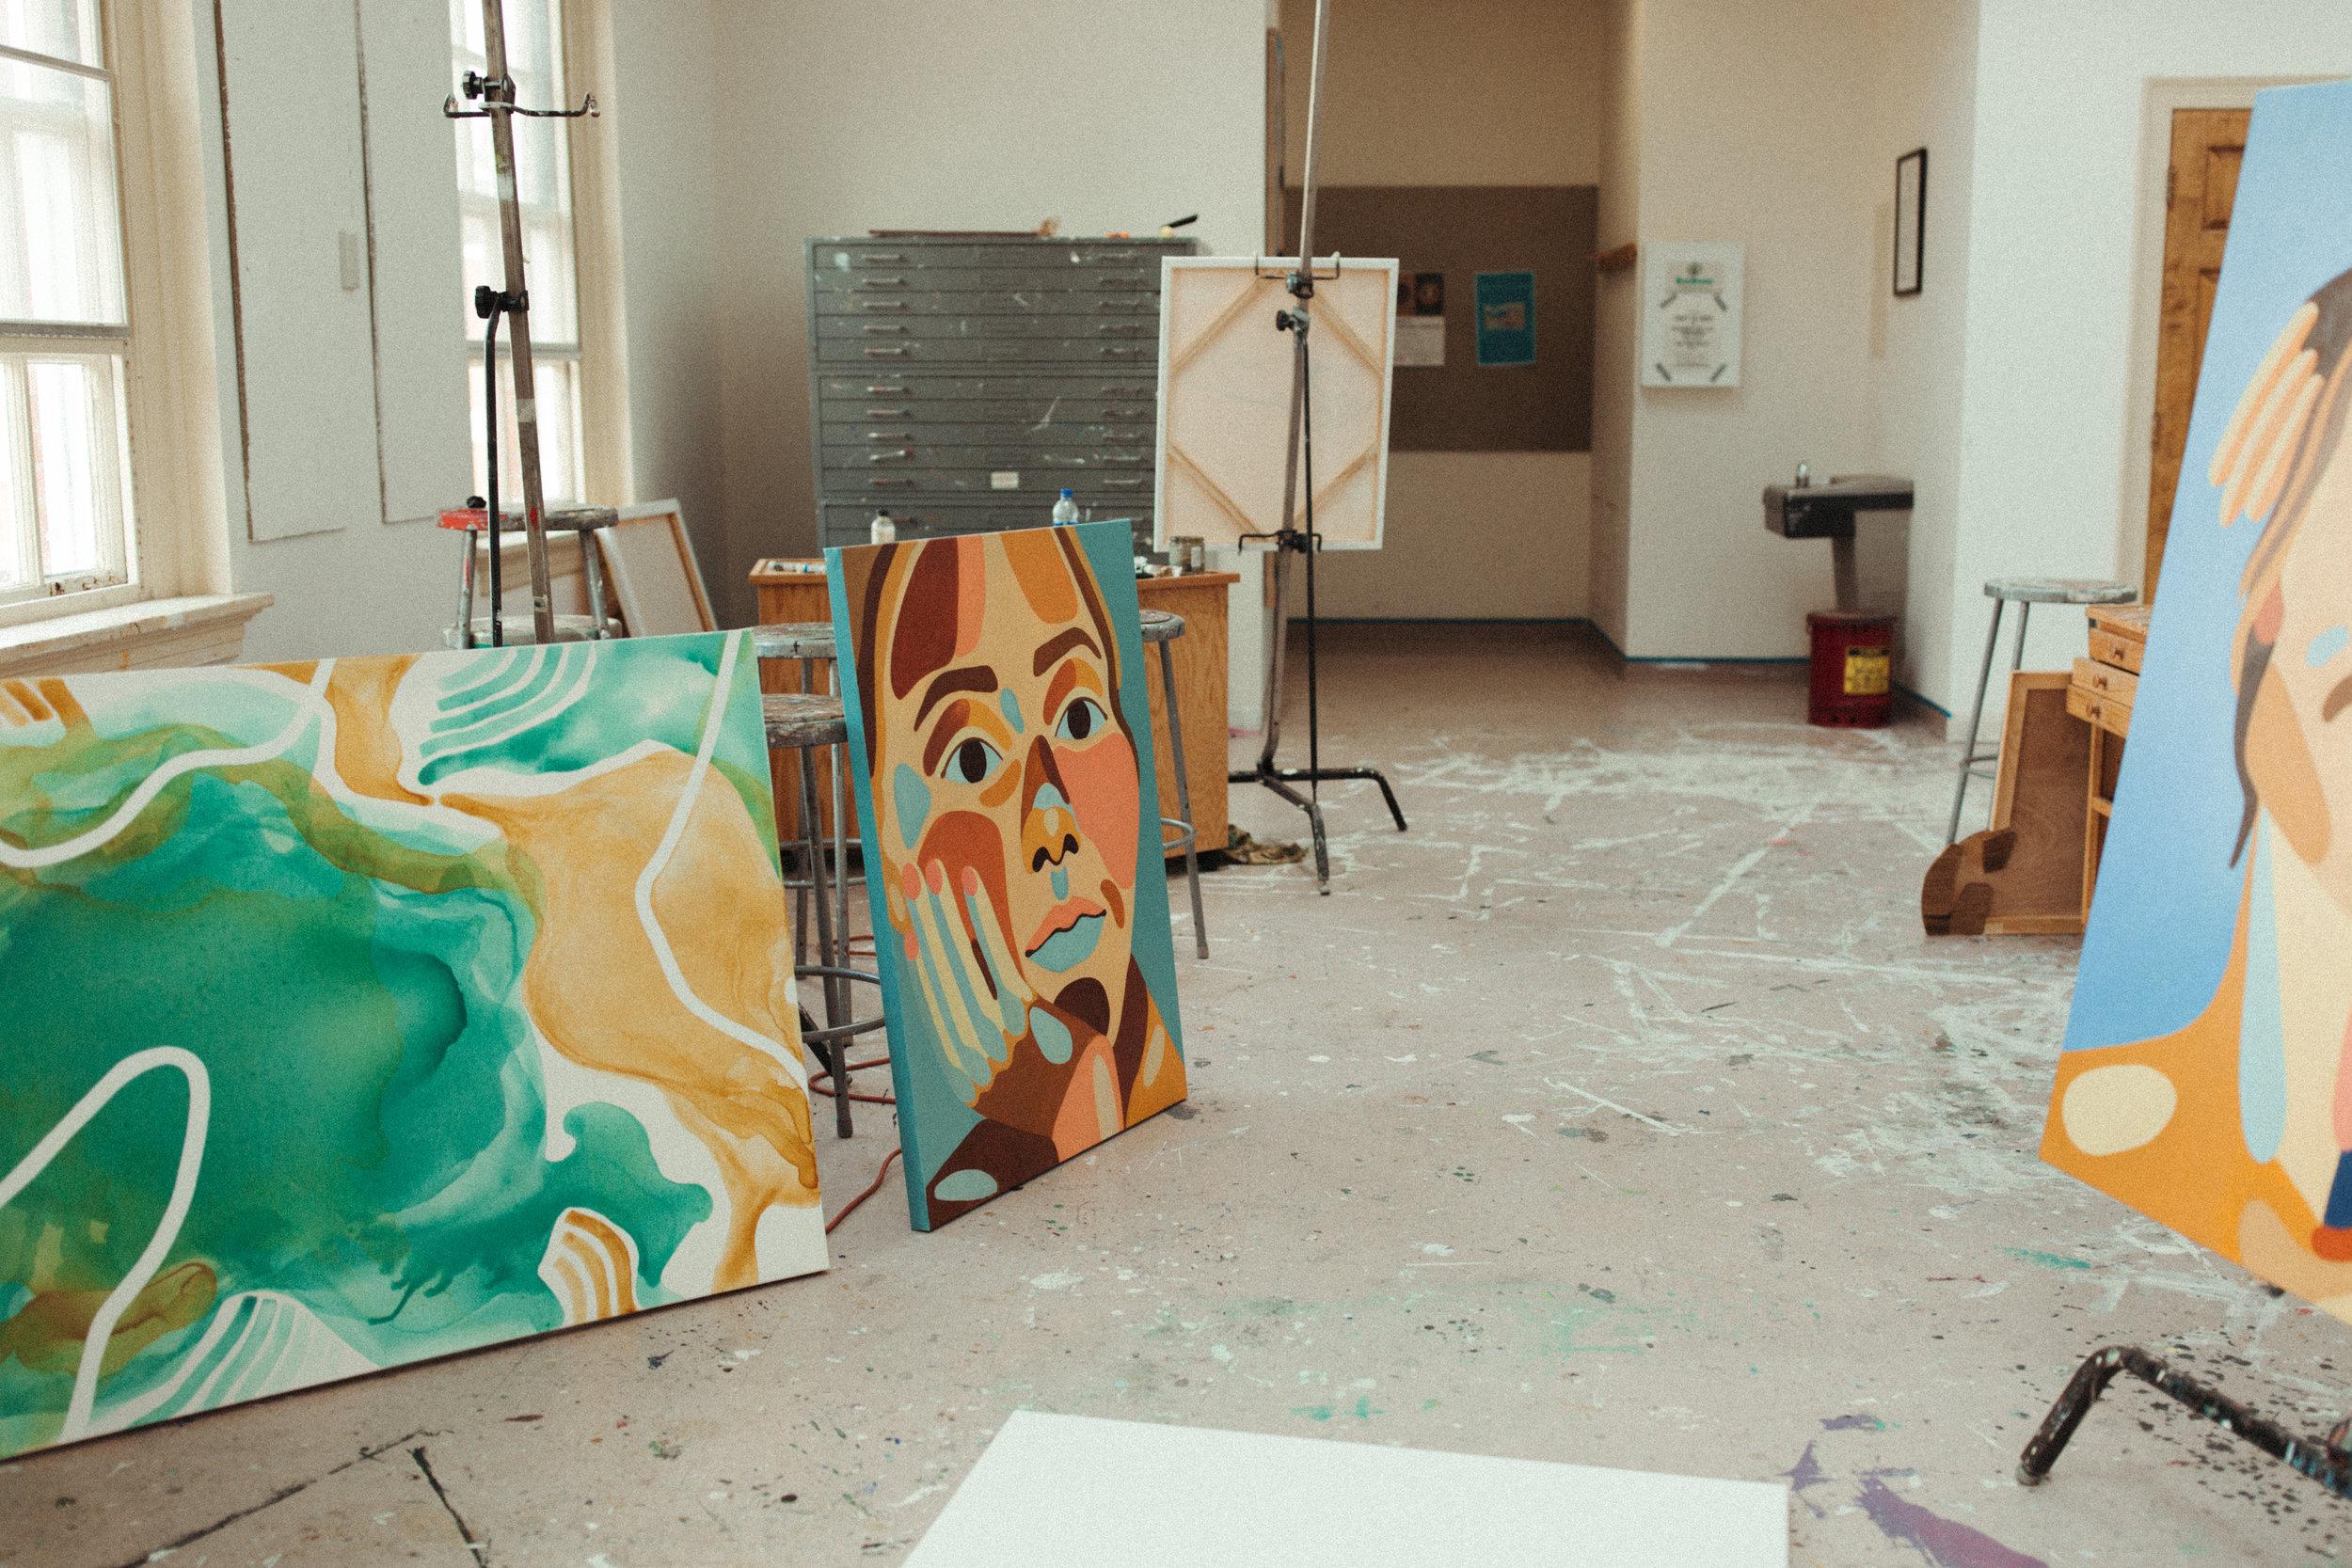 emily-pawlica-art-process-2019-peytoncurry-0322.jpg